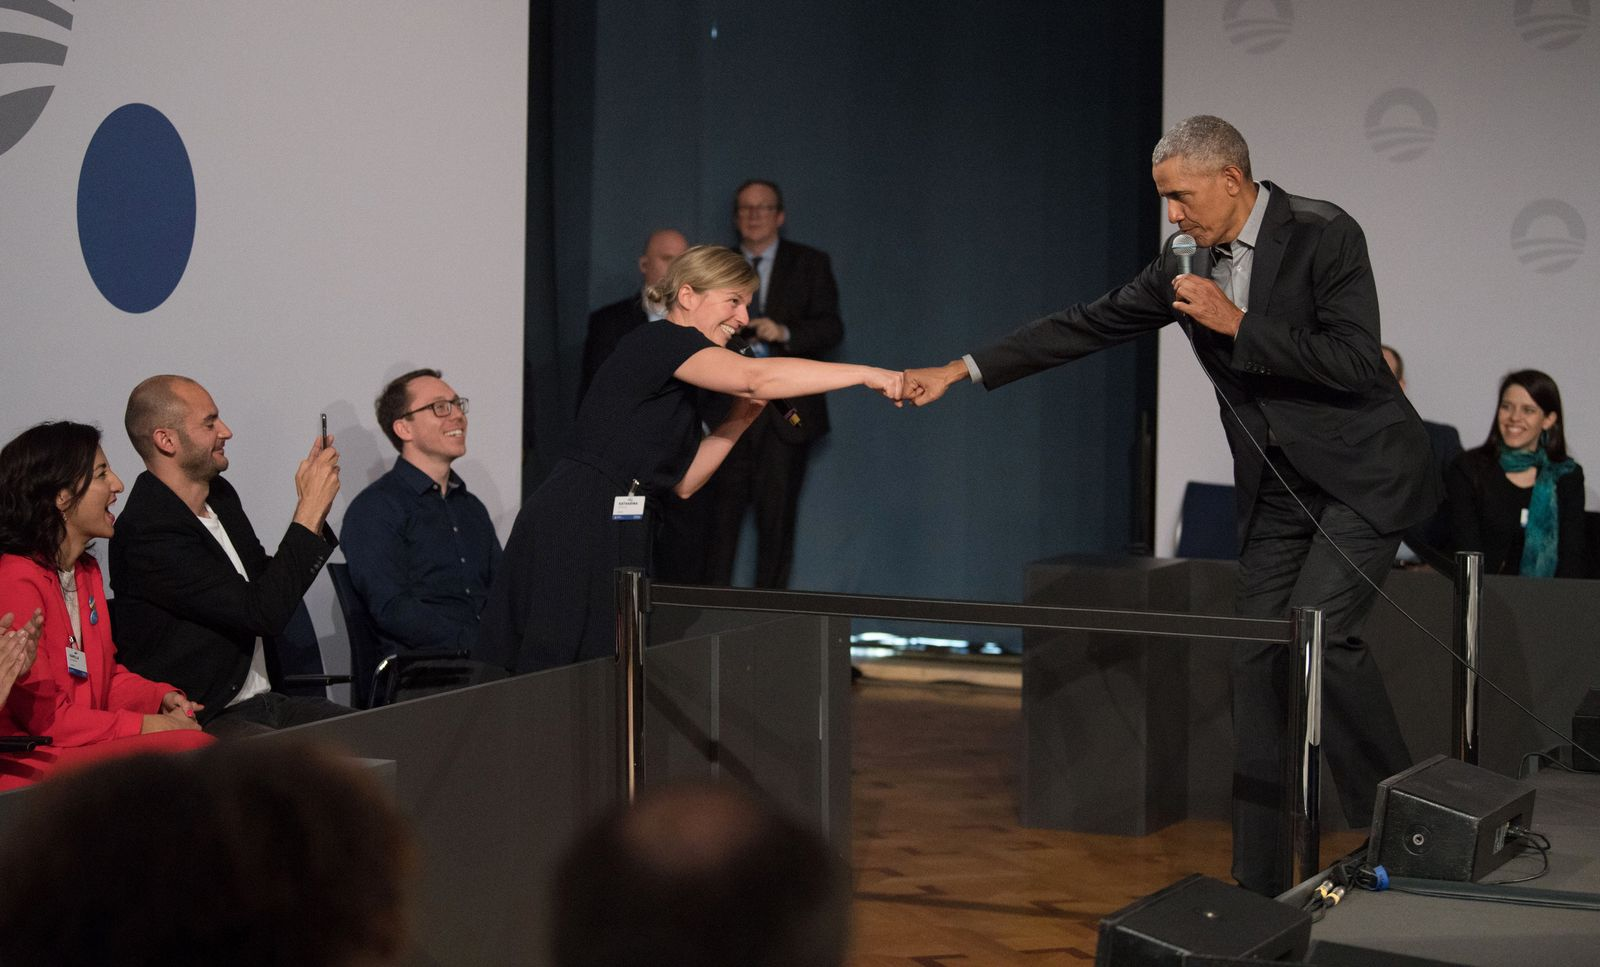 Obama Katharina Schulze